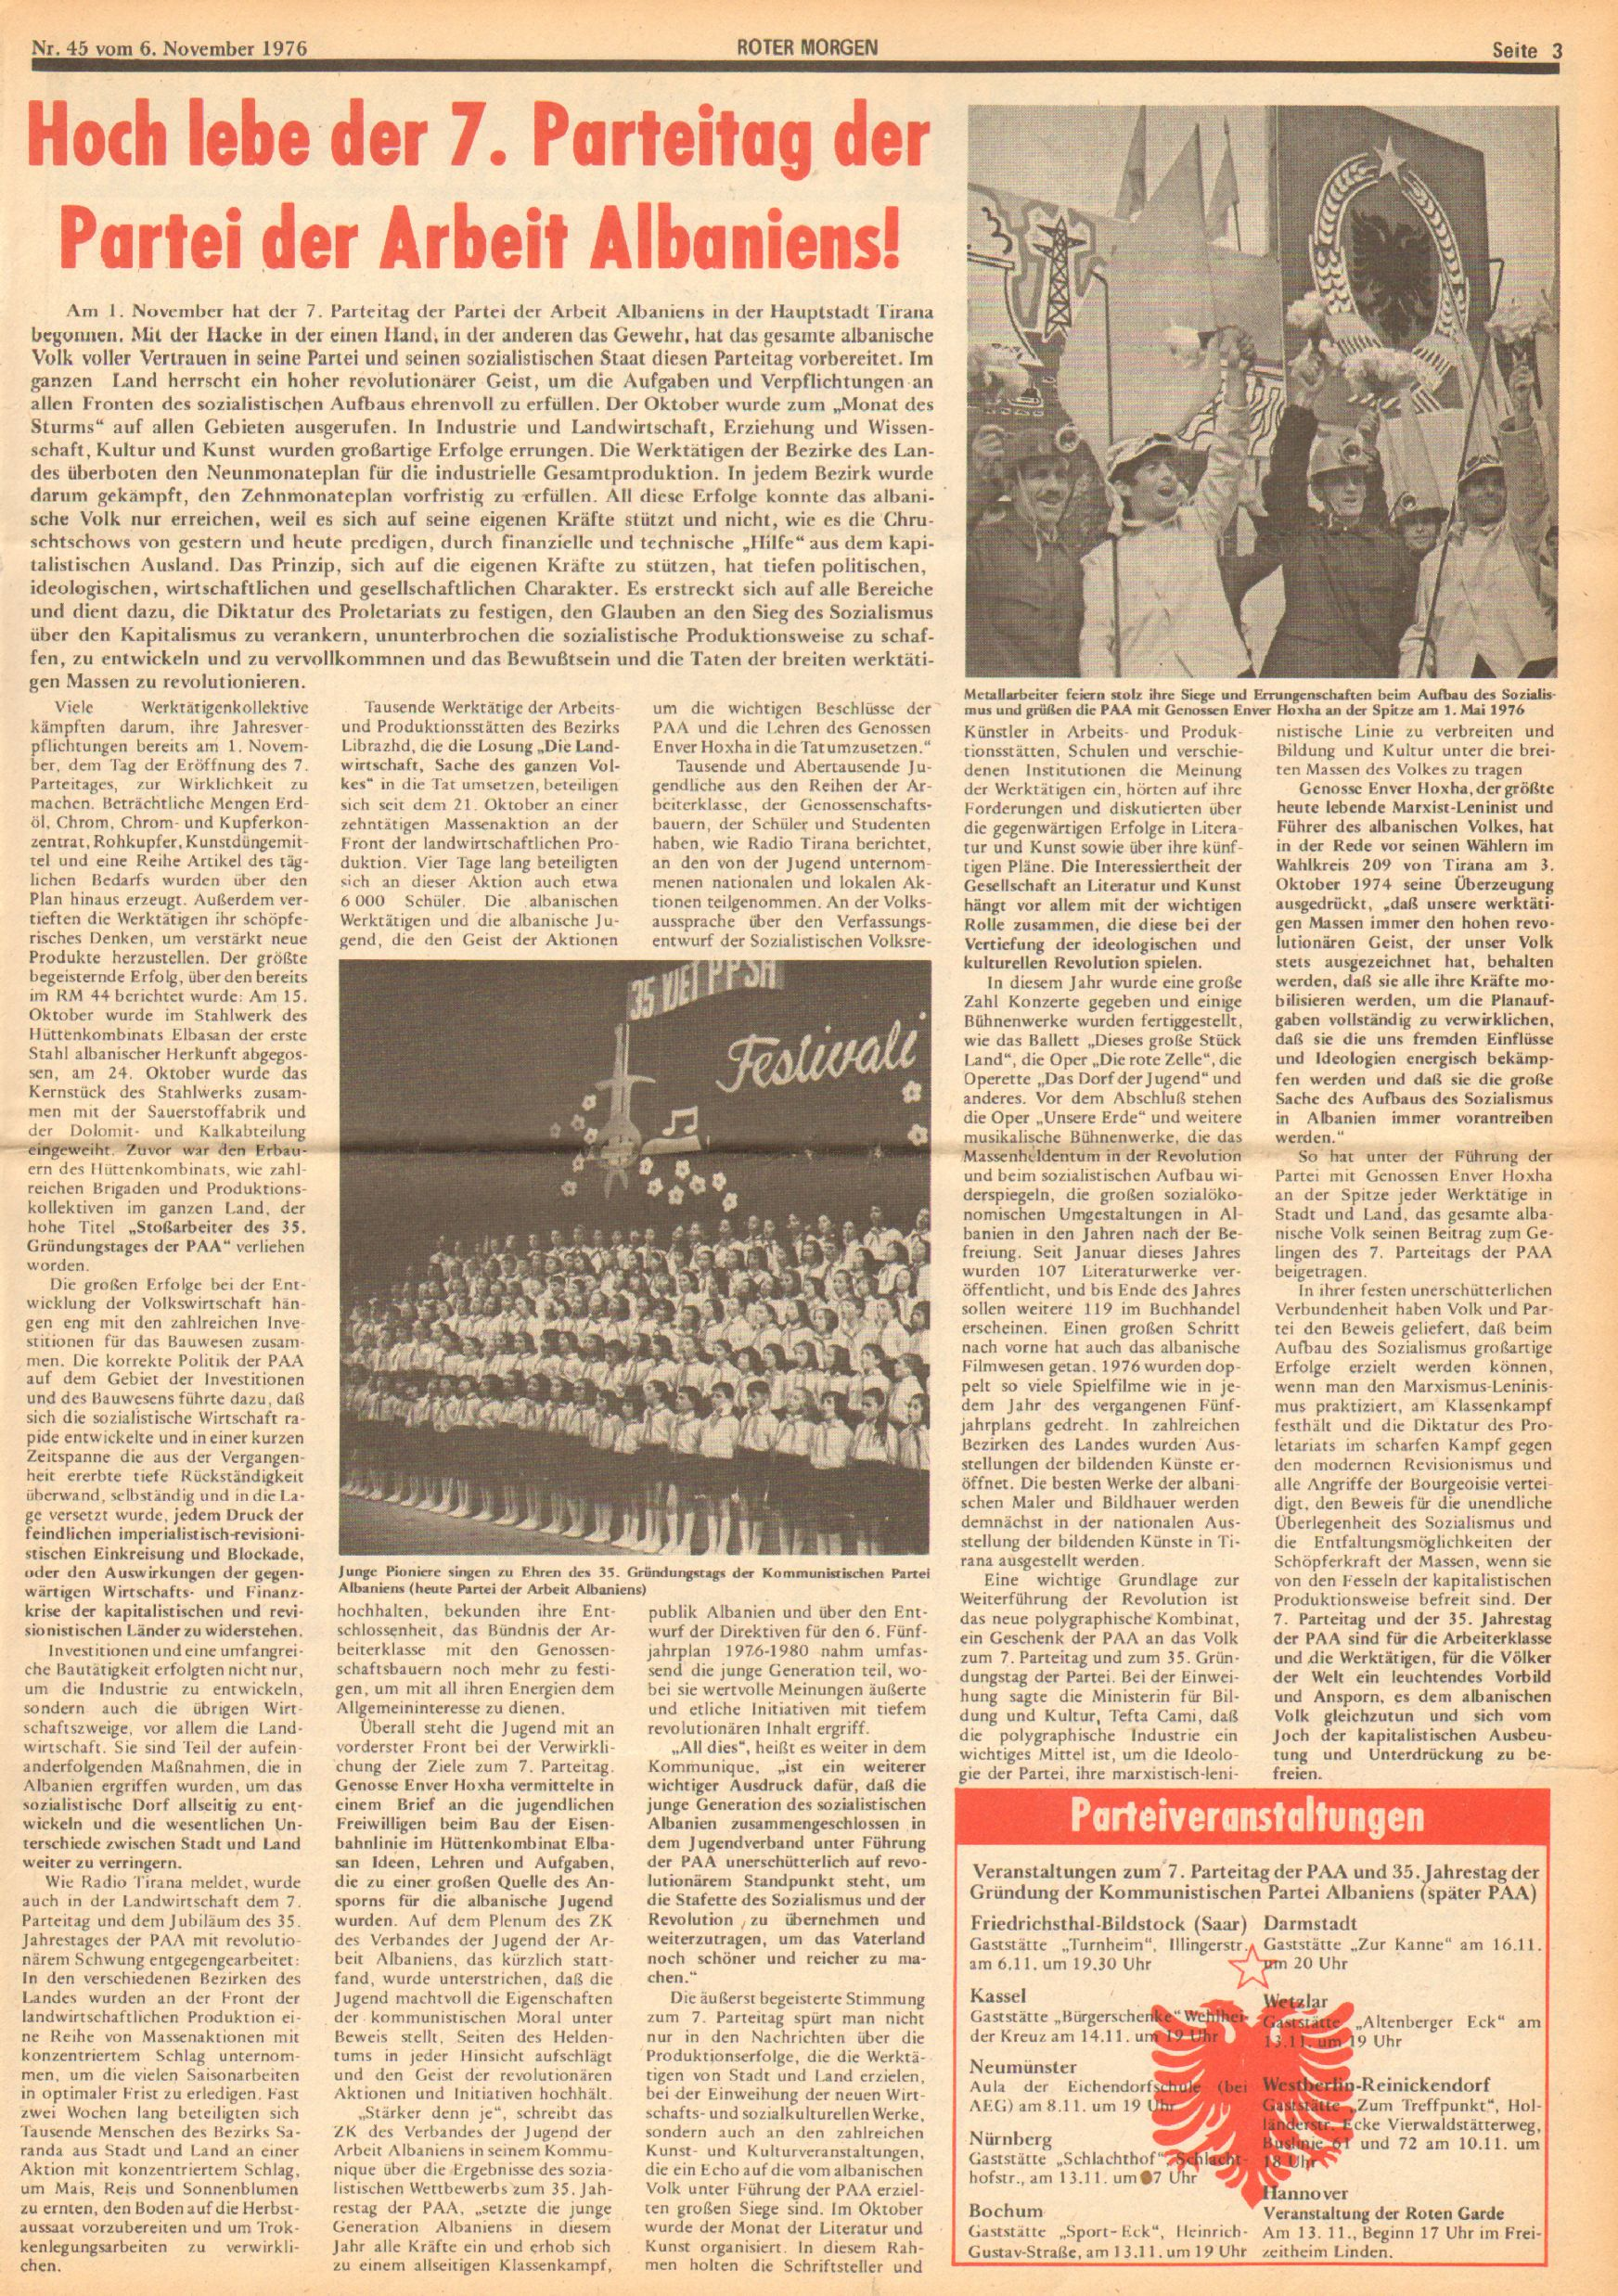 Roter Morgen, 10. Jg., 6. November 1976, Nr. 45, Seite 3